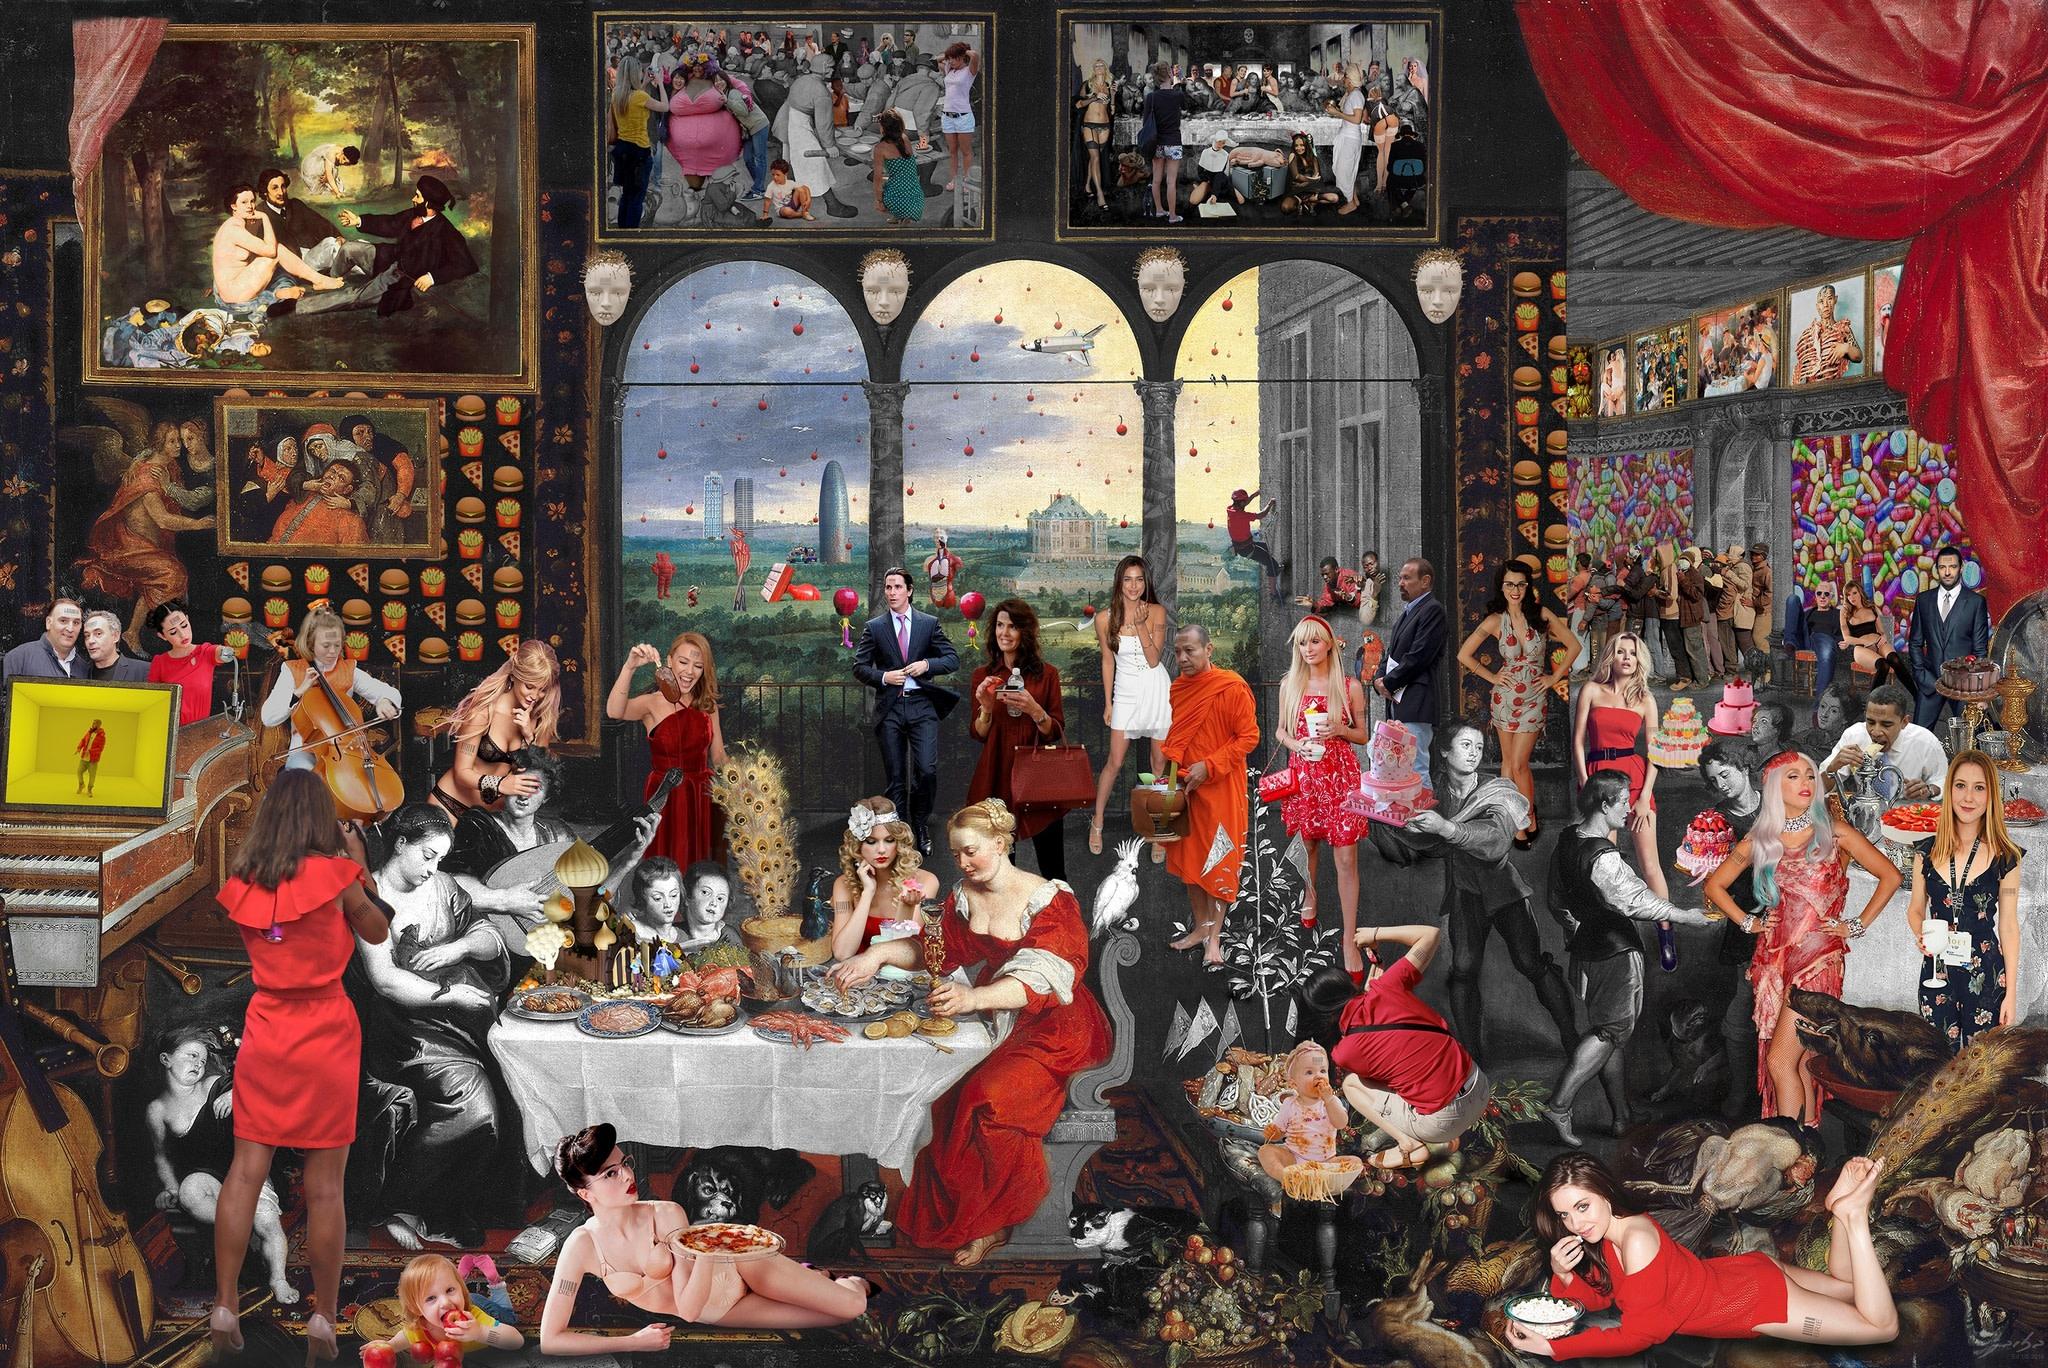 "<span class=""link fancybox-details-link""><a href=""/artists/30-lluis-barba/works/1417/"">View Detail Page</a></span><div class=""artist""><strong>Lluís Barba</strong></div> <div class=""title""><em>Taste. Jan Brueghel & Peter Paul Rubens</em>, 2016</div> <div class=""medium"">C-Type Print, Diasec Mounted<br />  </div> <div class=""dimensions"">162.6 x 243.8 cm<br />64 x 96 in.</div> <div class=""edition_details""></div><div class=""copyright_line"">Copyright The Artist</div>"